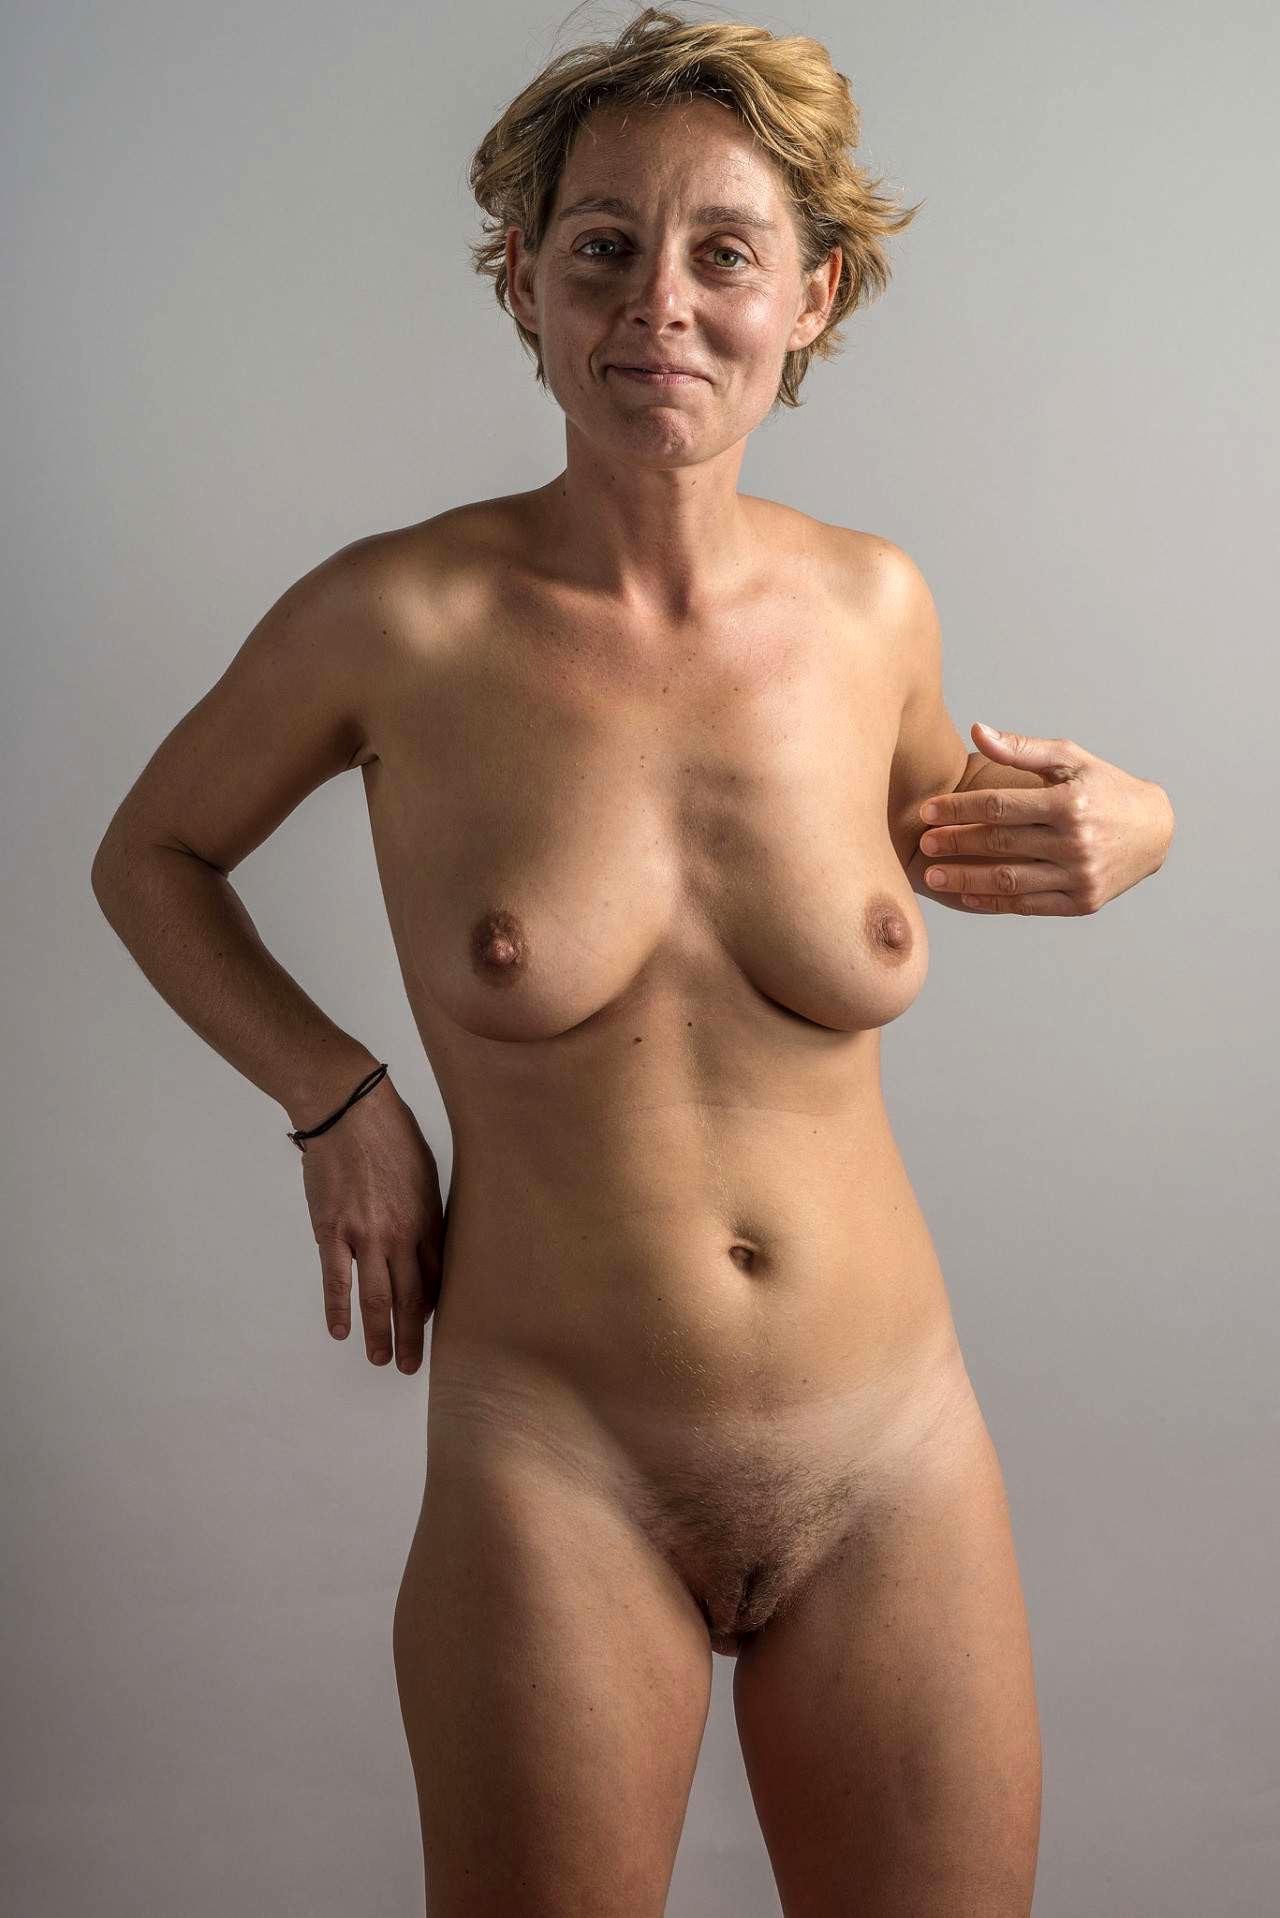 over 50 nude tumblr